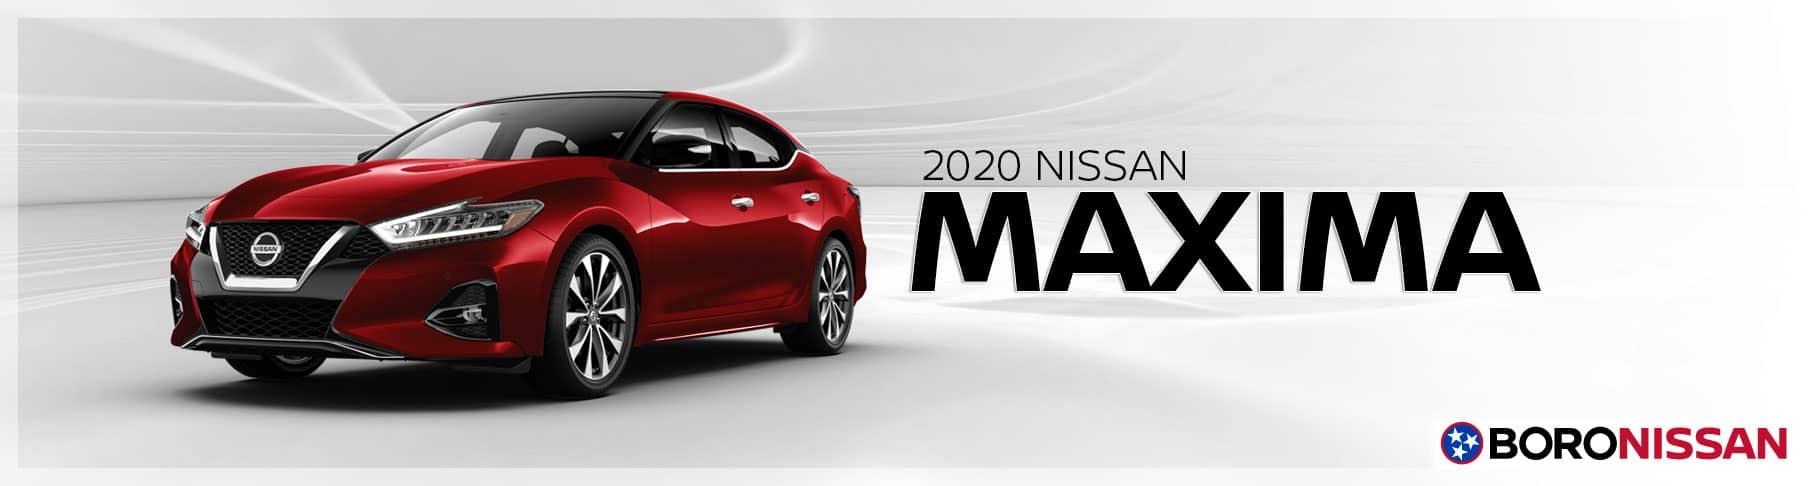 The New 2020 Nissan Maxima Near Nashville, Tennessee